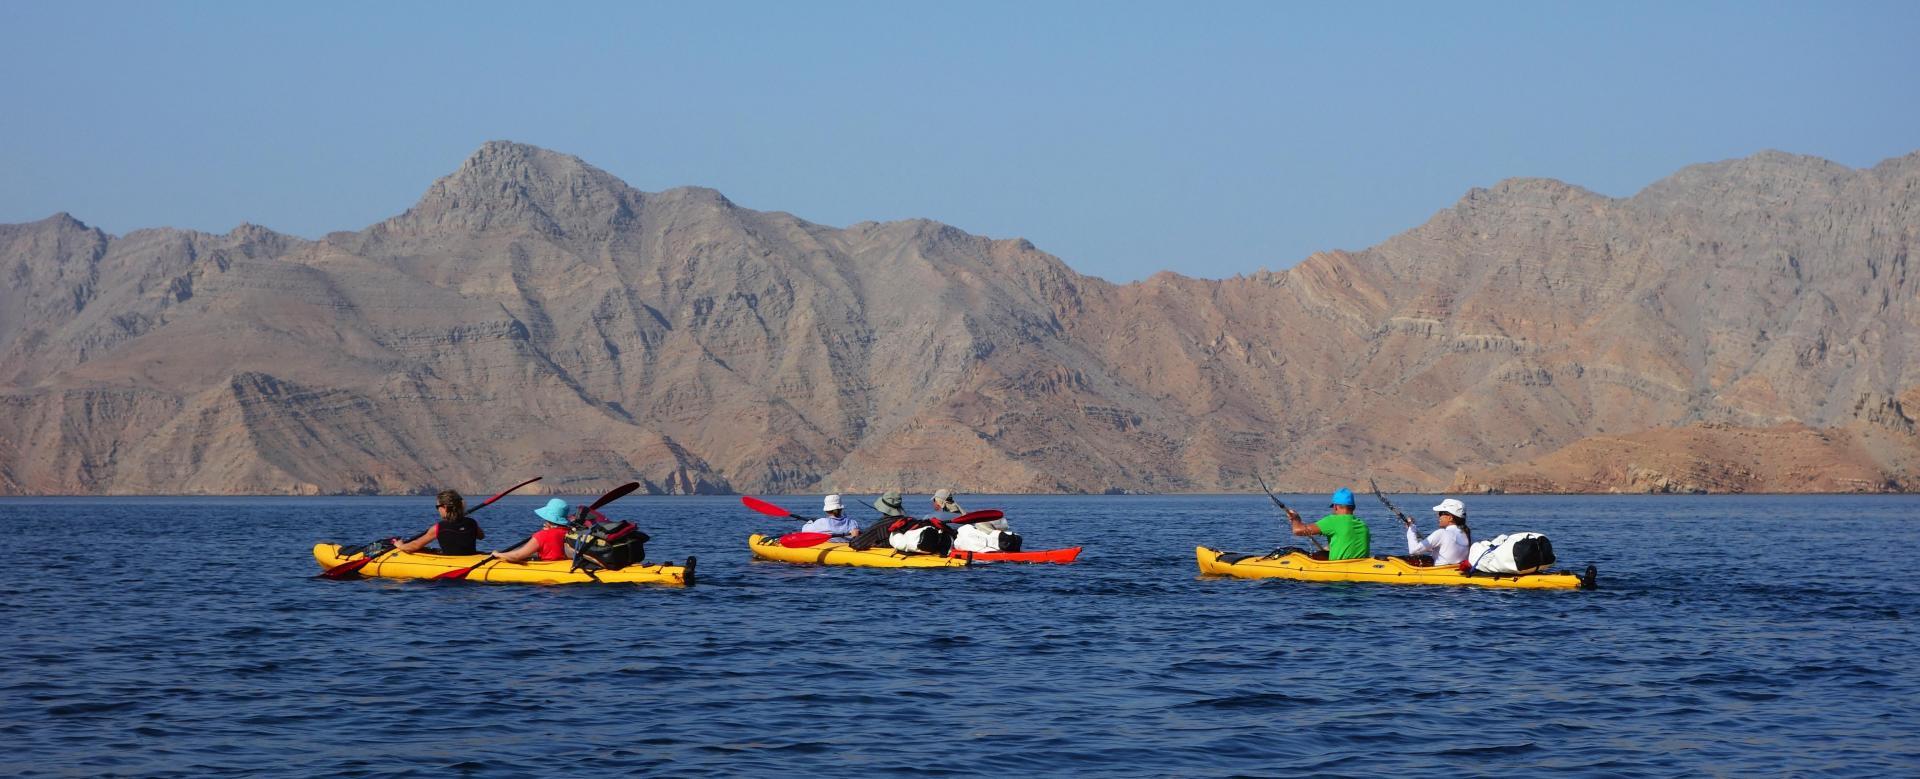 Voyage à pied : Trek et kayak au musandam